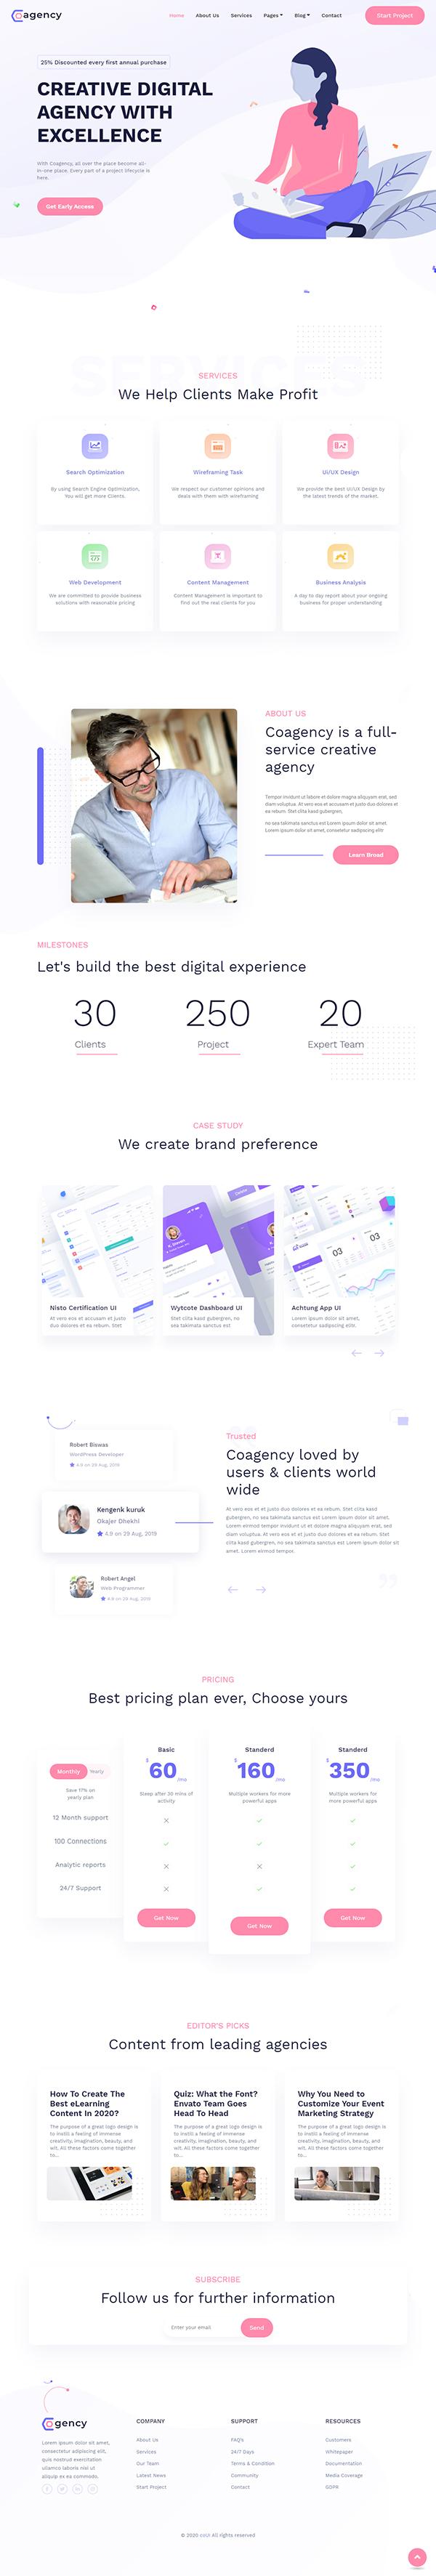 Cogency - Digital Agency Multipurpose WordPress Theme